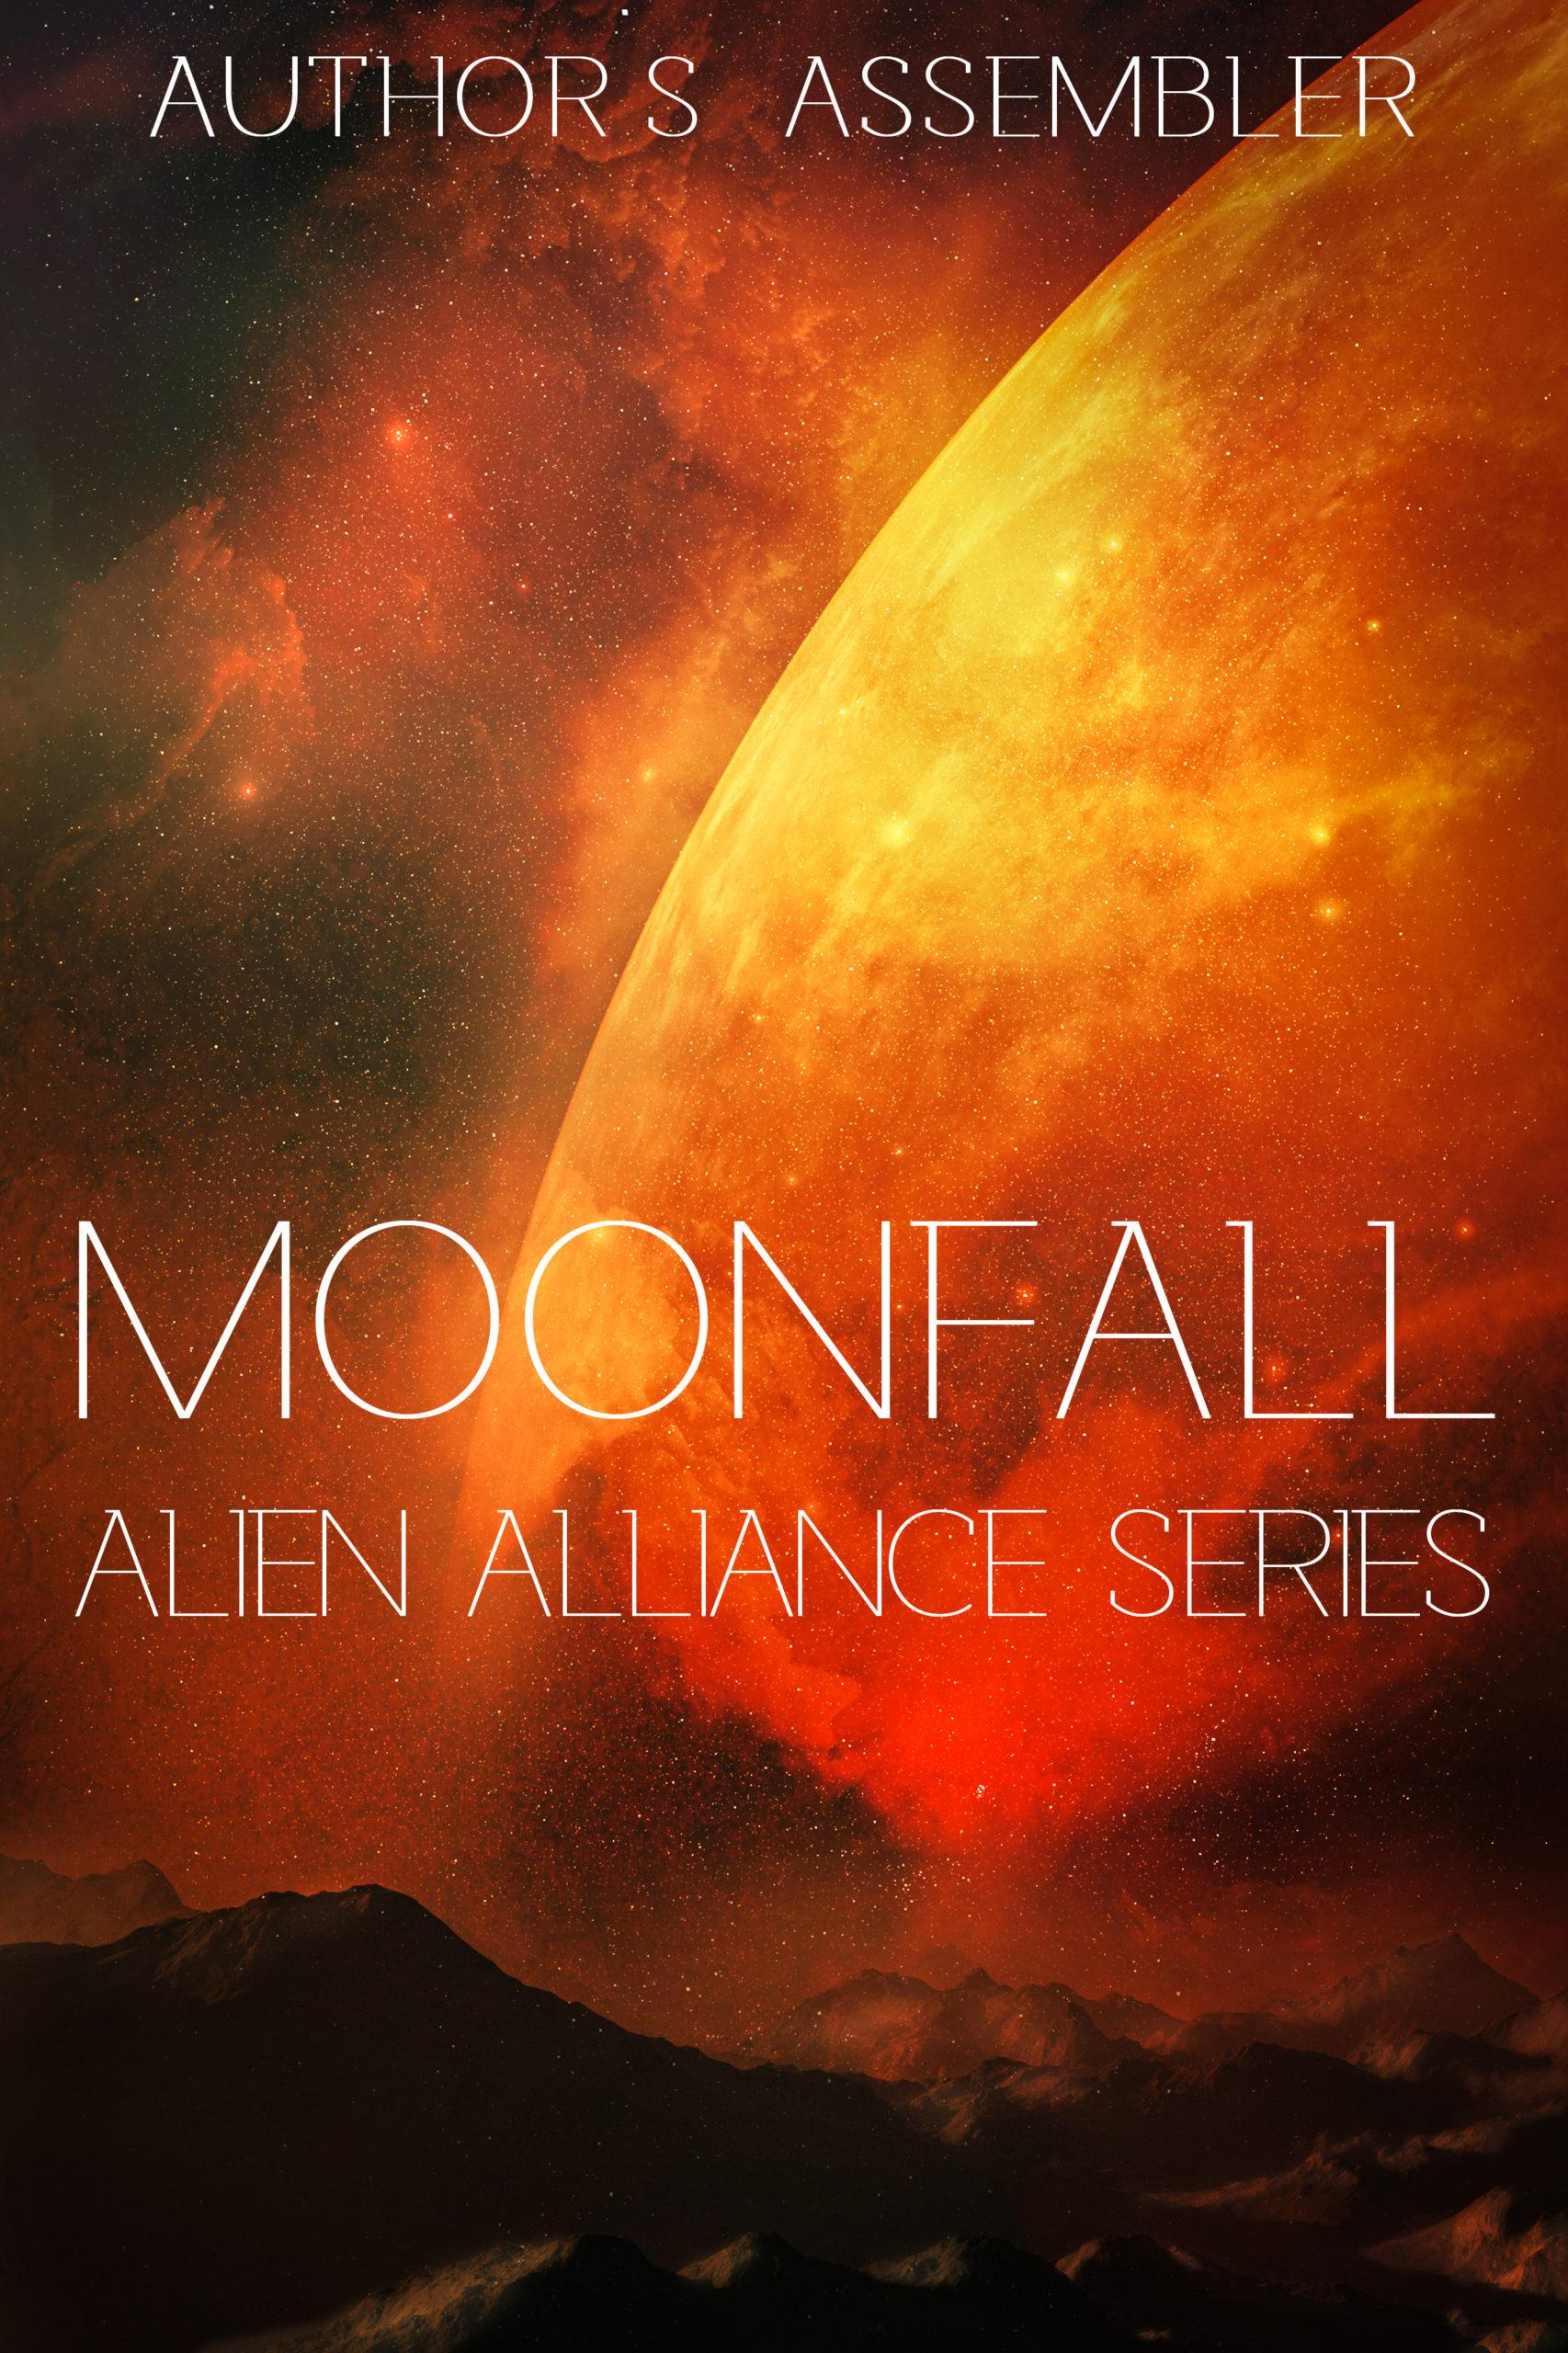 Premade - Moonfall_500x750